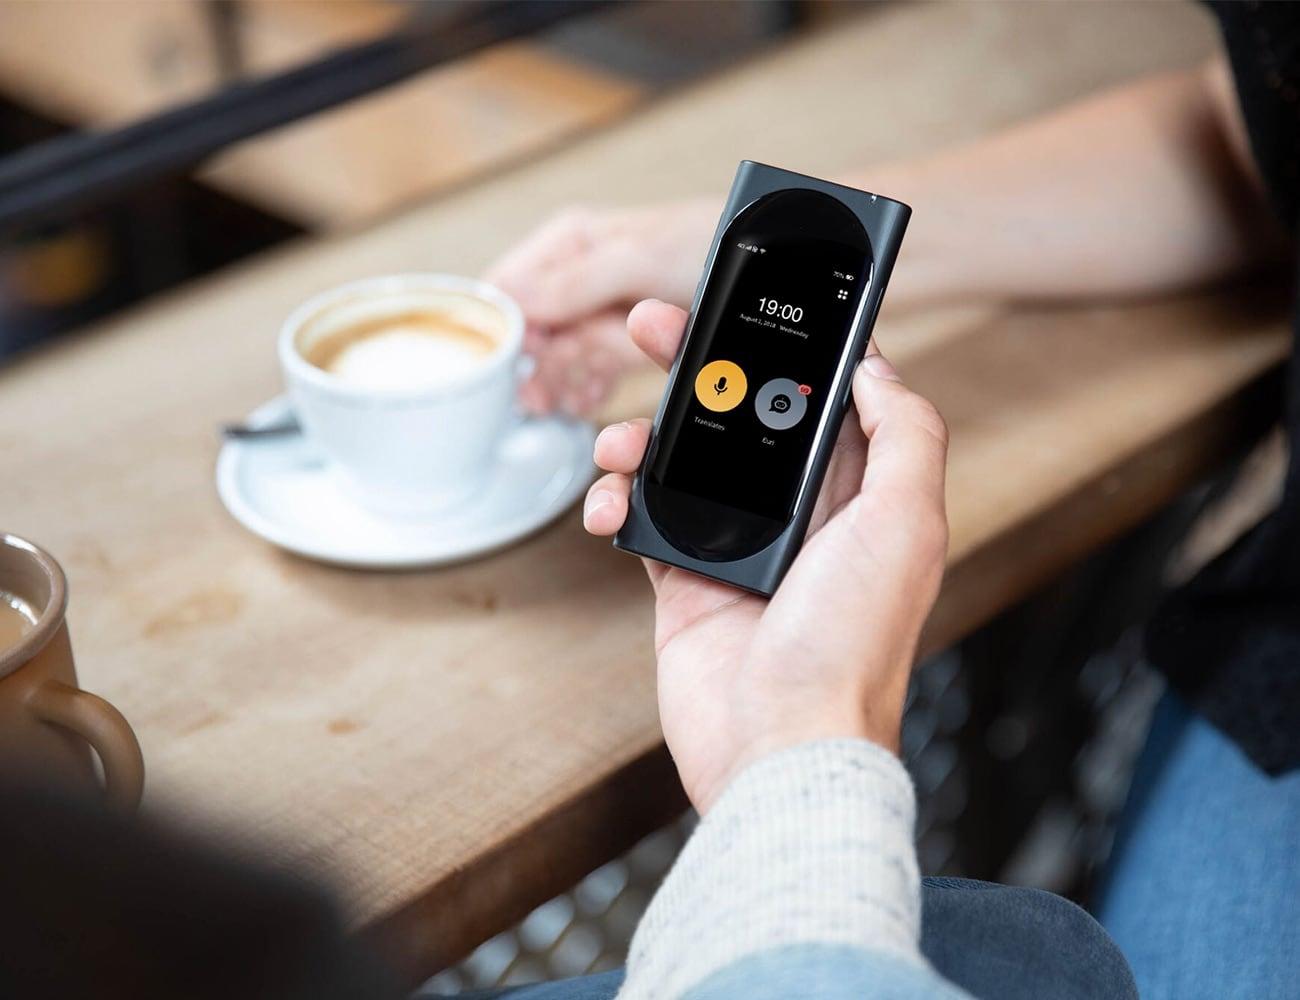 Langogo AI Pocket Translator and Wi-Fi Hotspot